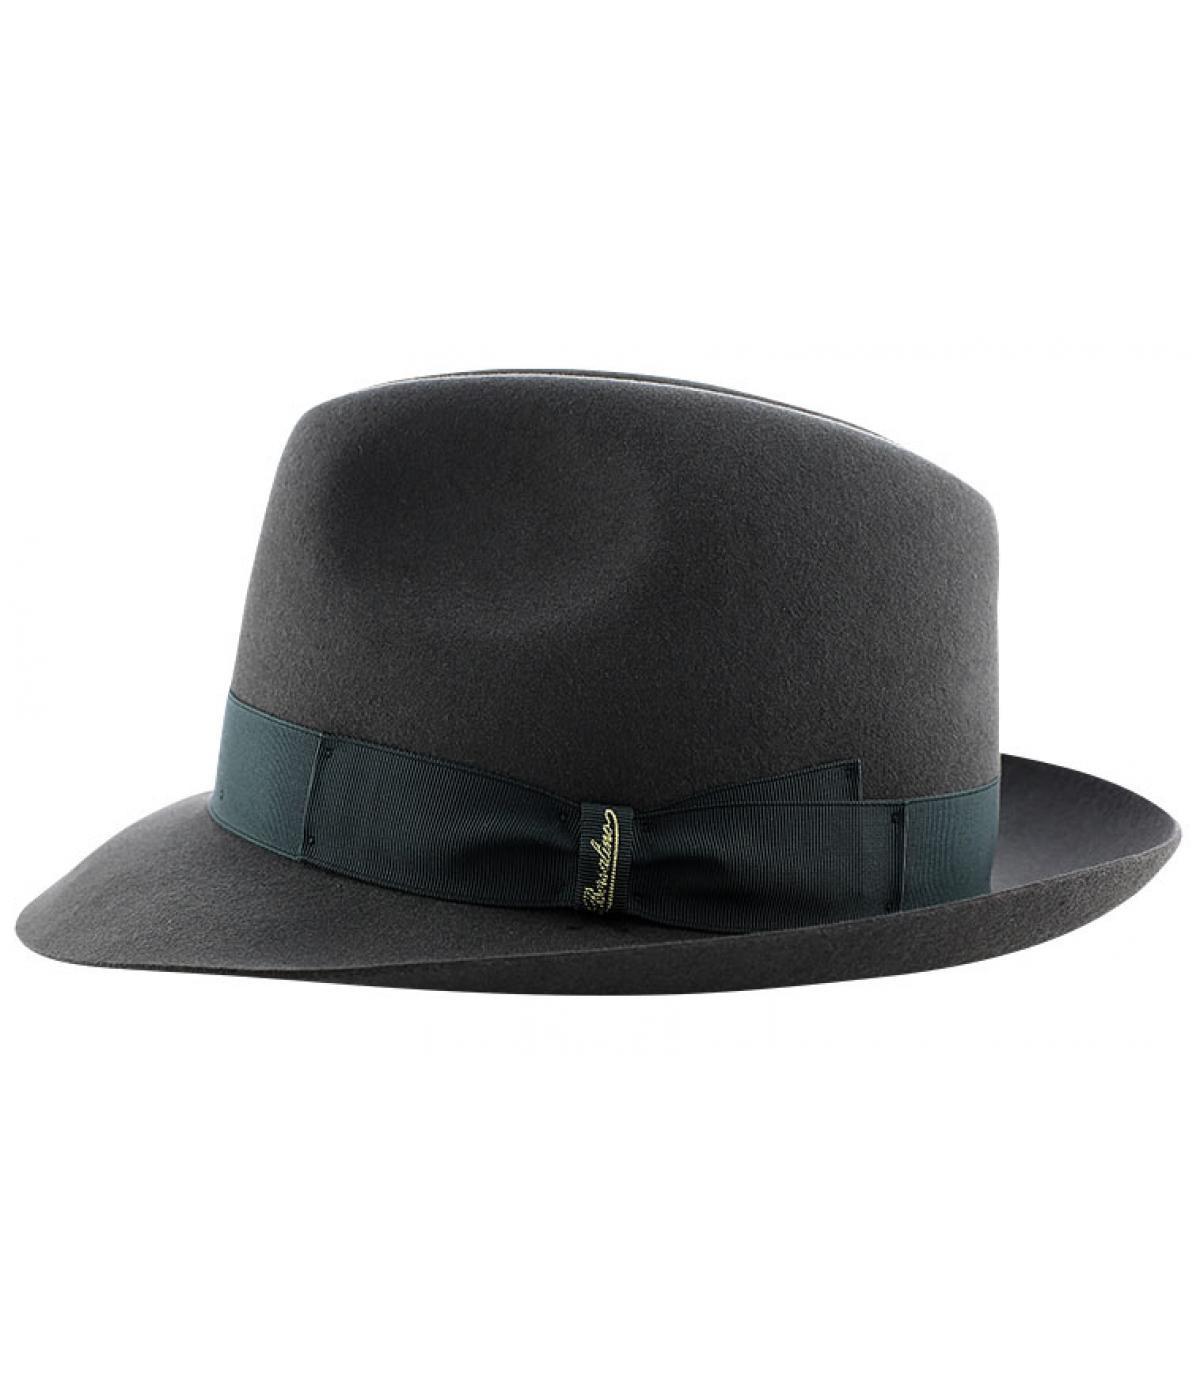 Details Marengo grey fur felt hat - Abbildung 4